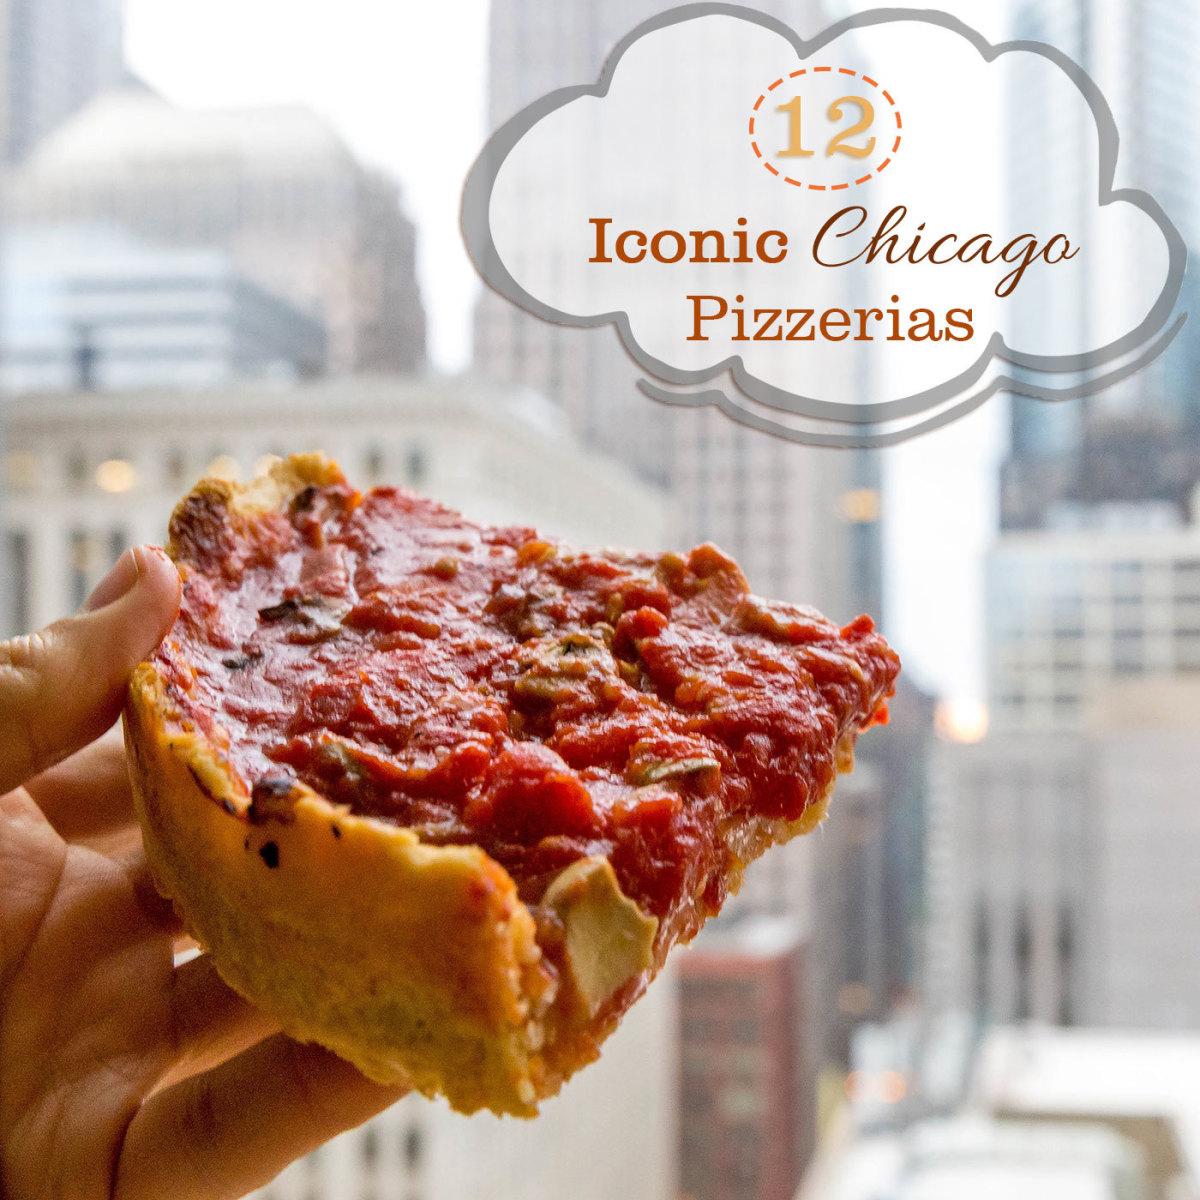 Slice of Pizzeria Uno deep dish pizza overlooking Chicago